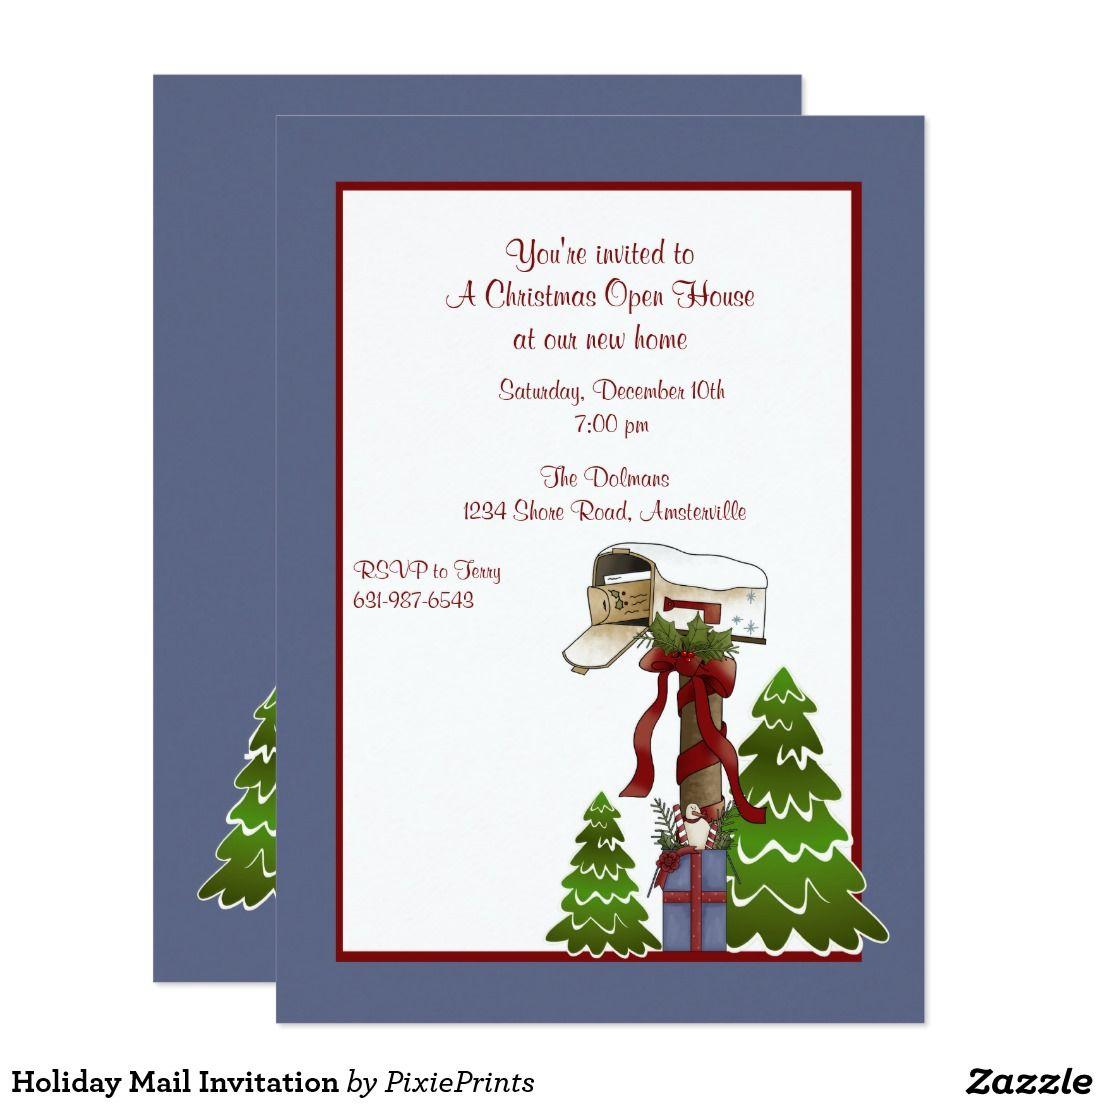 Holiday Mail Invitation | Christmas Party Invitations | Pinterest ...